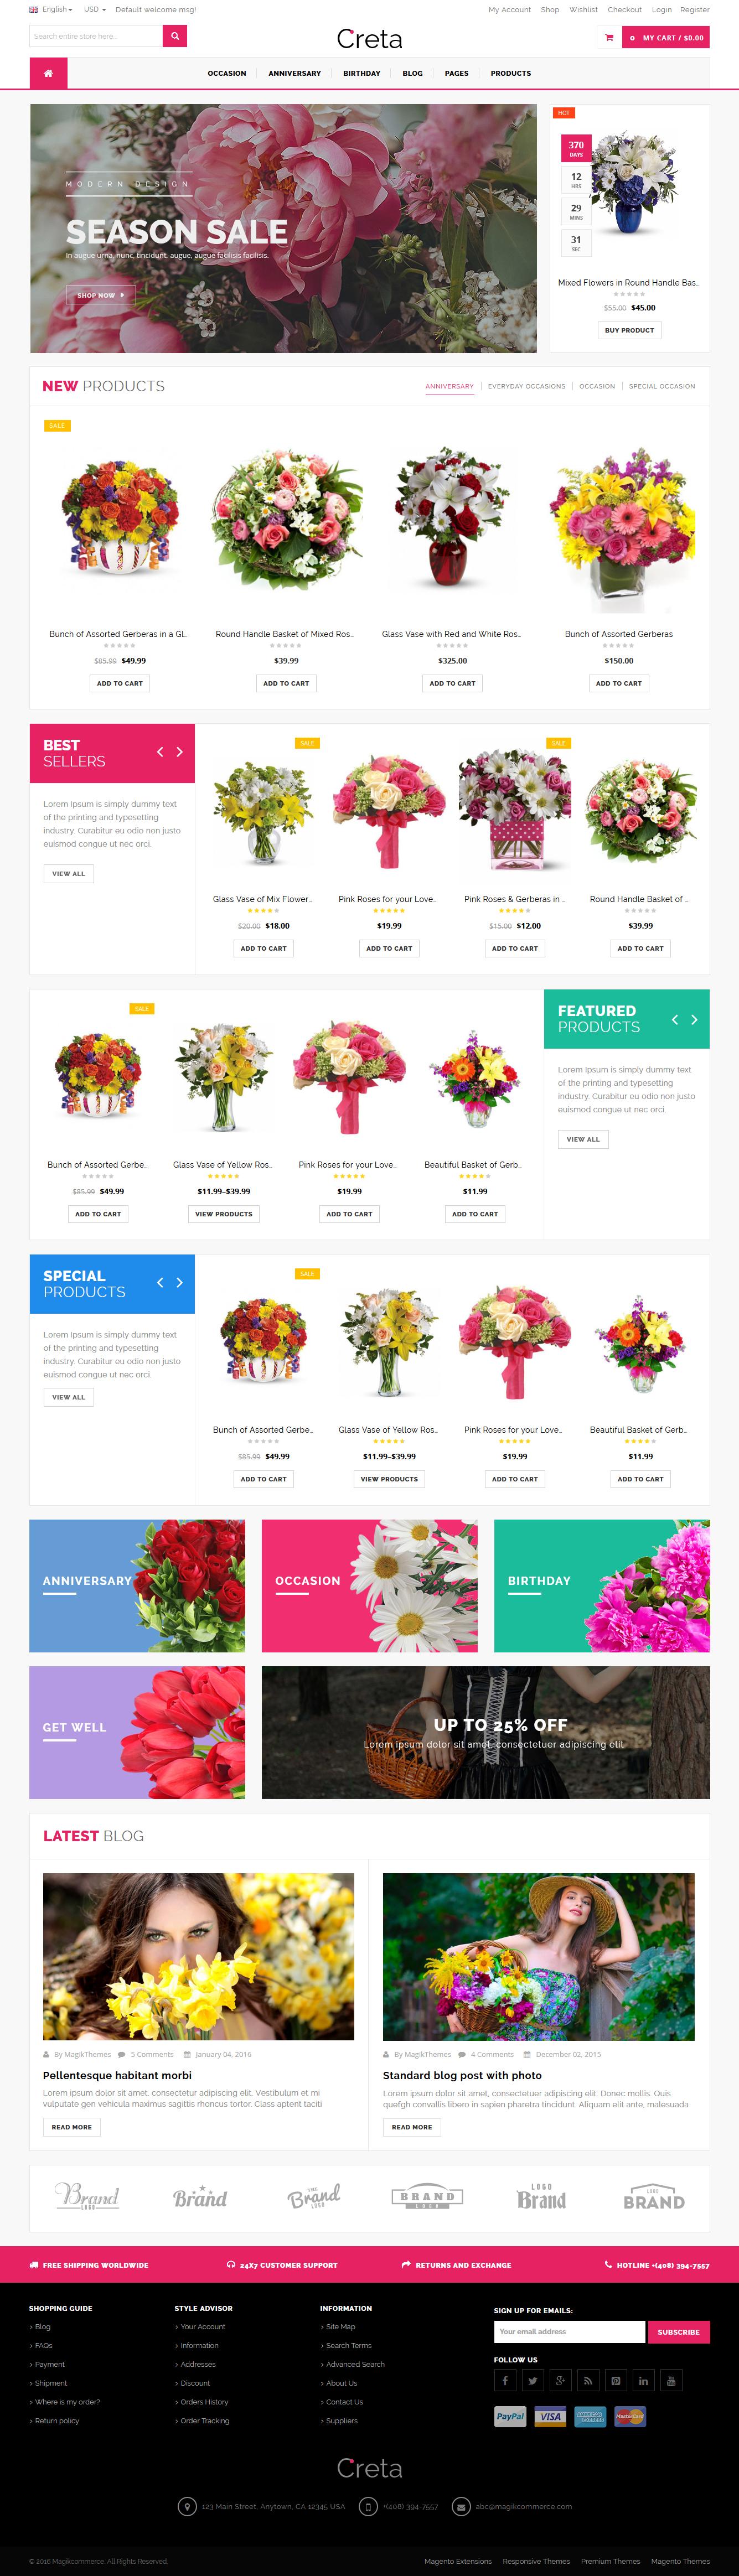 Creta Flower Shop Woocommerce Wordpress Theme By